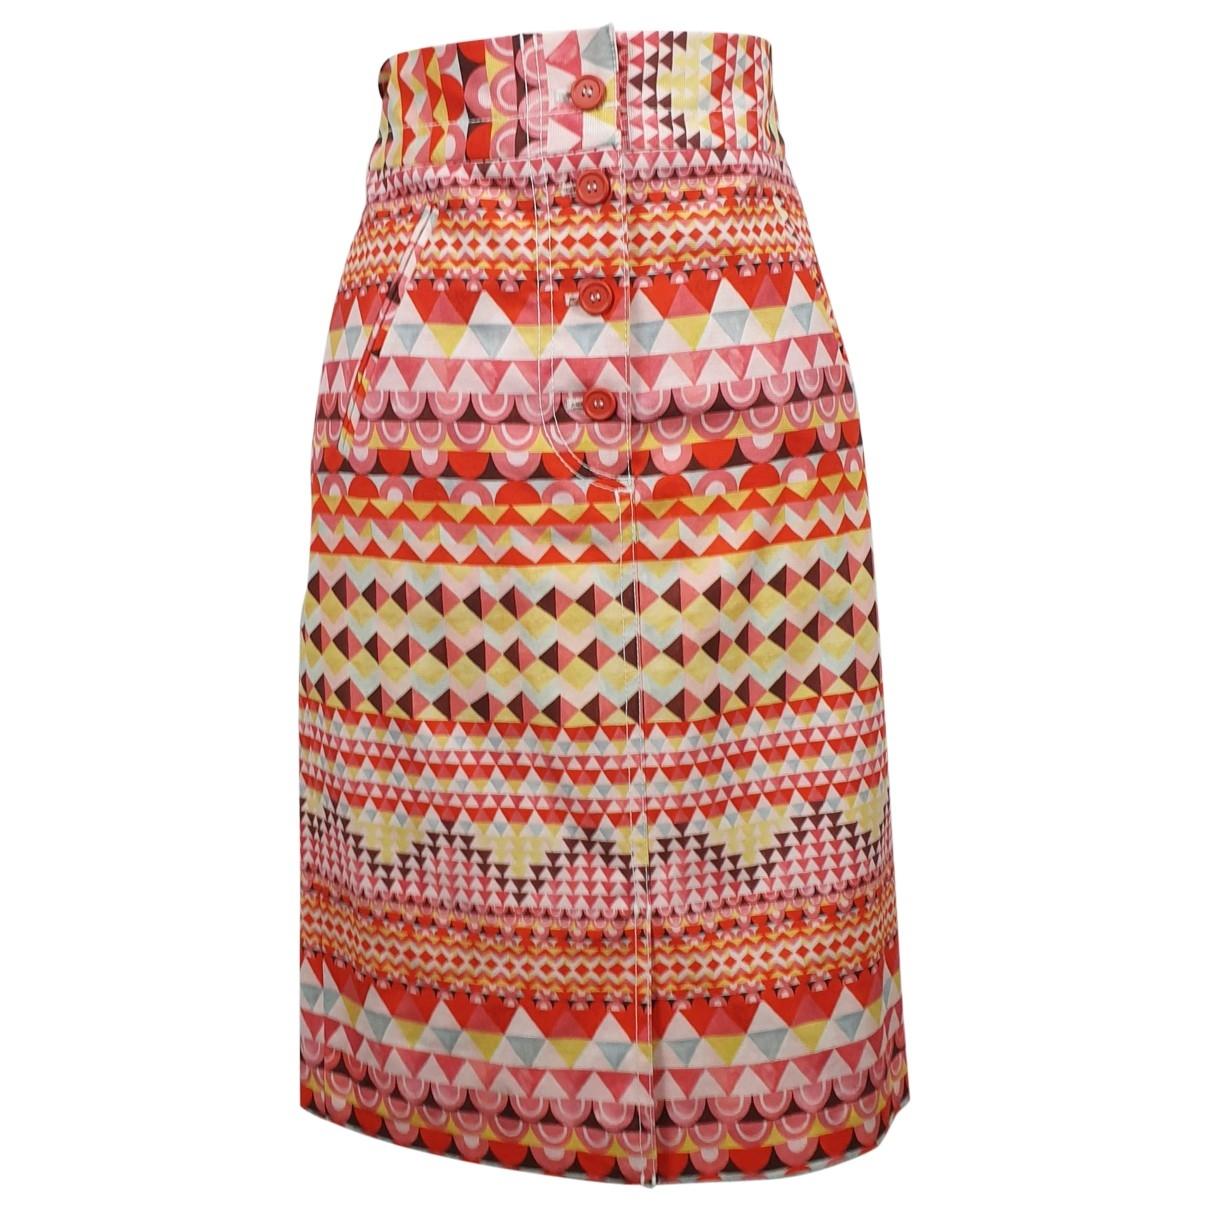 M Missoni \N Multicolour Cotton - elasthane skirt for Women 40 IT